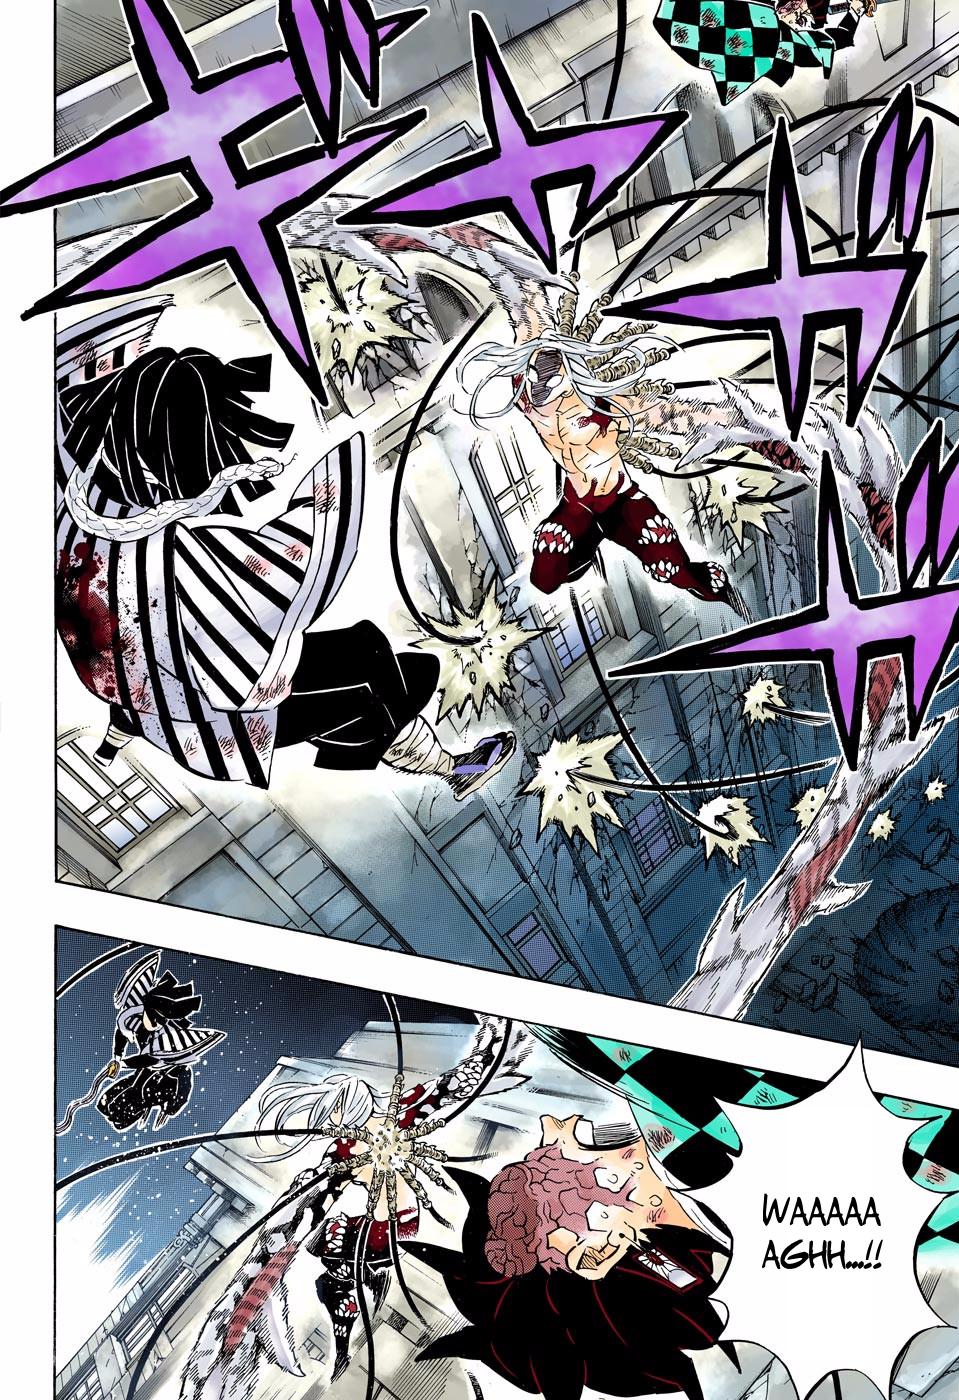 Kimetsu no Yaiba Digital Colored Comics Chapter 194 in